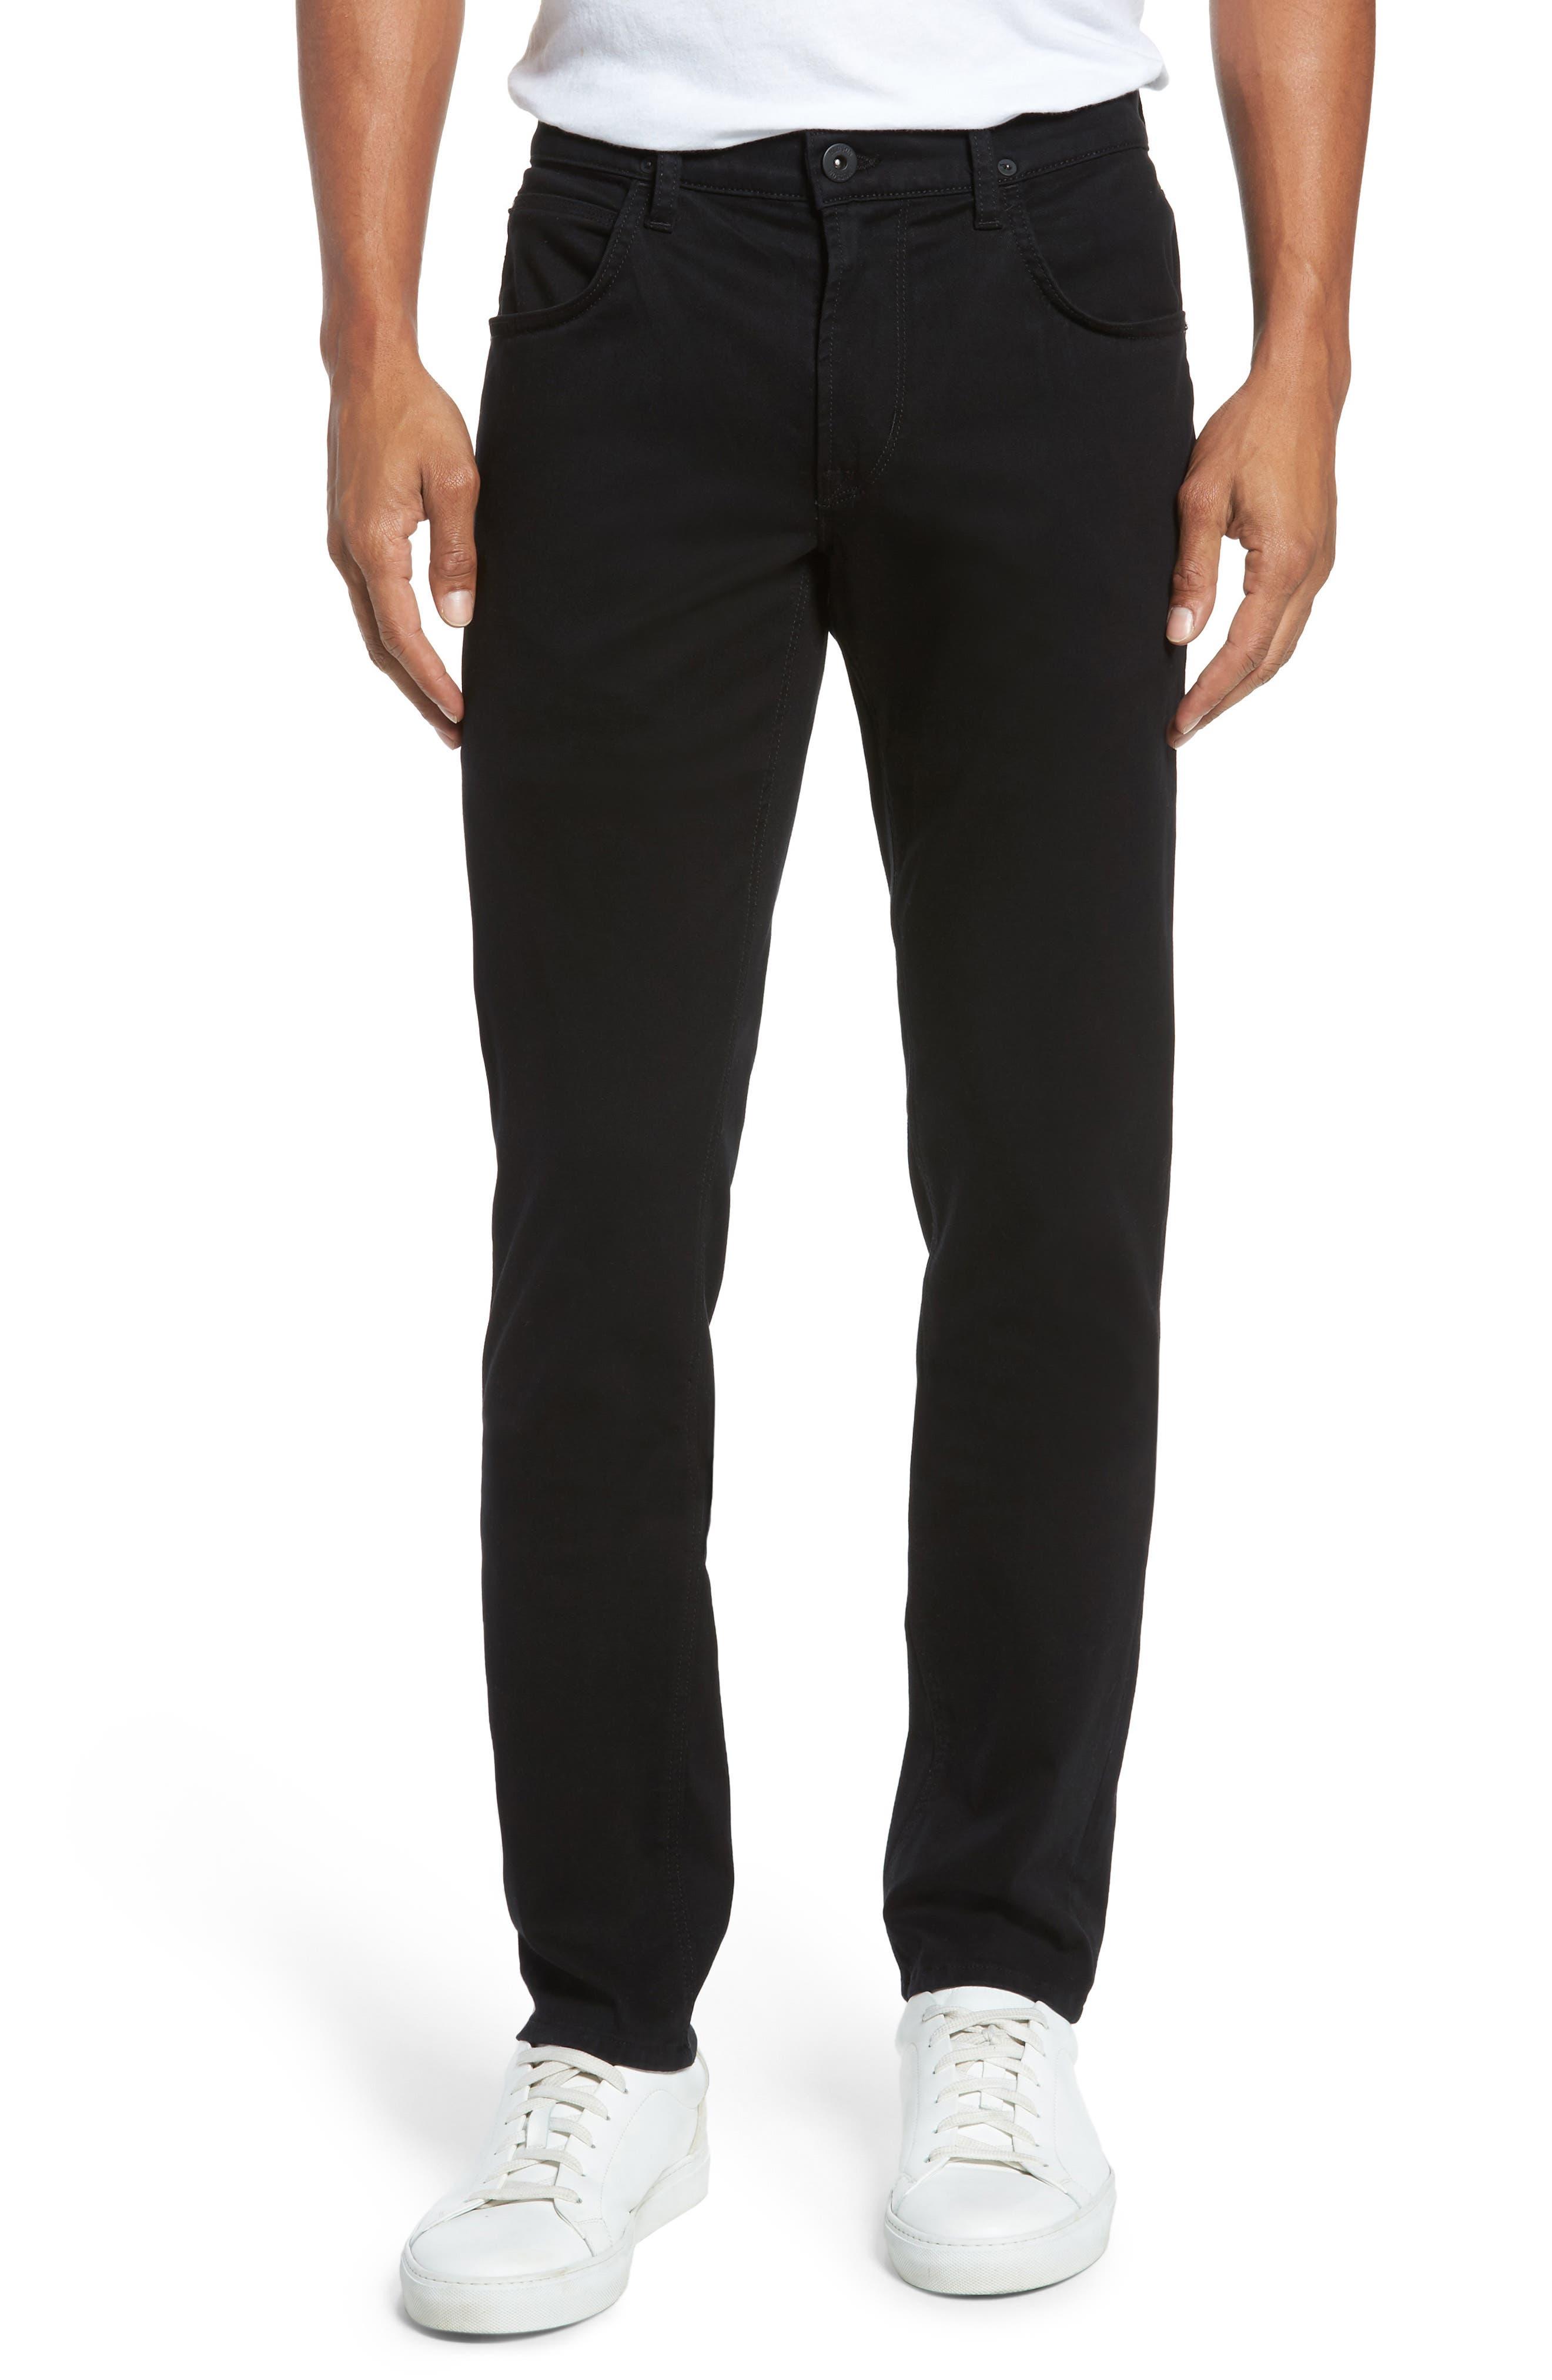 Alternate Image 1 Selected - Hudson Jeans Blake Slim Fit Jeans (Blackened)